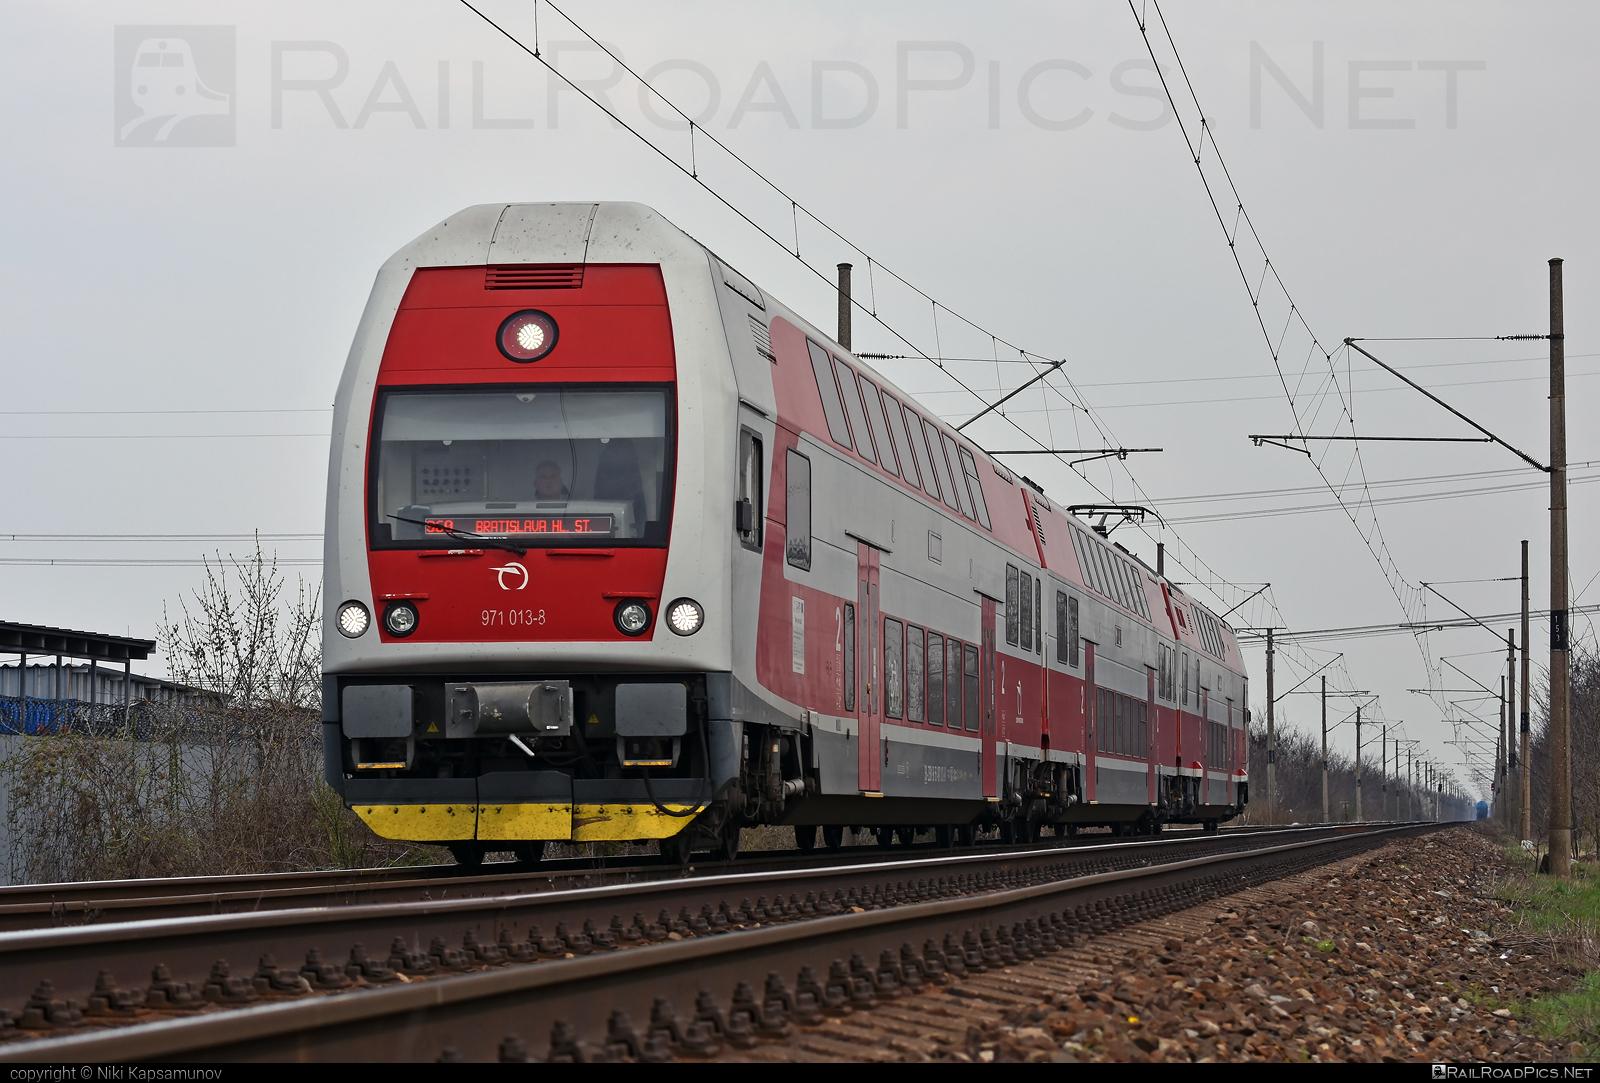 Škoda 4Ev - 971 013-8 operated by Železničná Spoločnost' Slovensko, a.s. #ZeleznicnaSpolocnostSlovensko #emu671 #skoda #skoda4ev #skodaclass671 #zssk